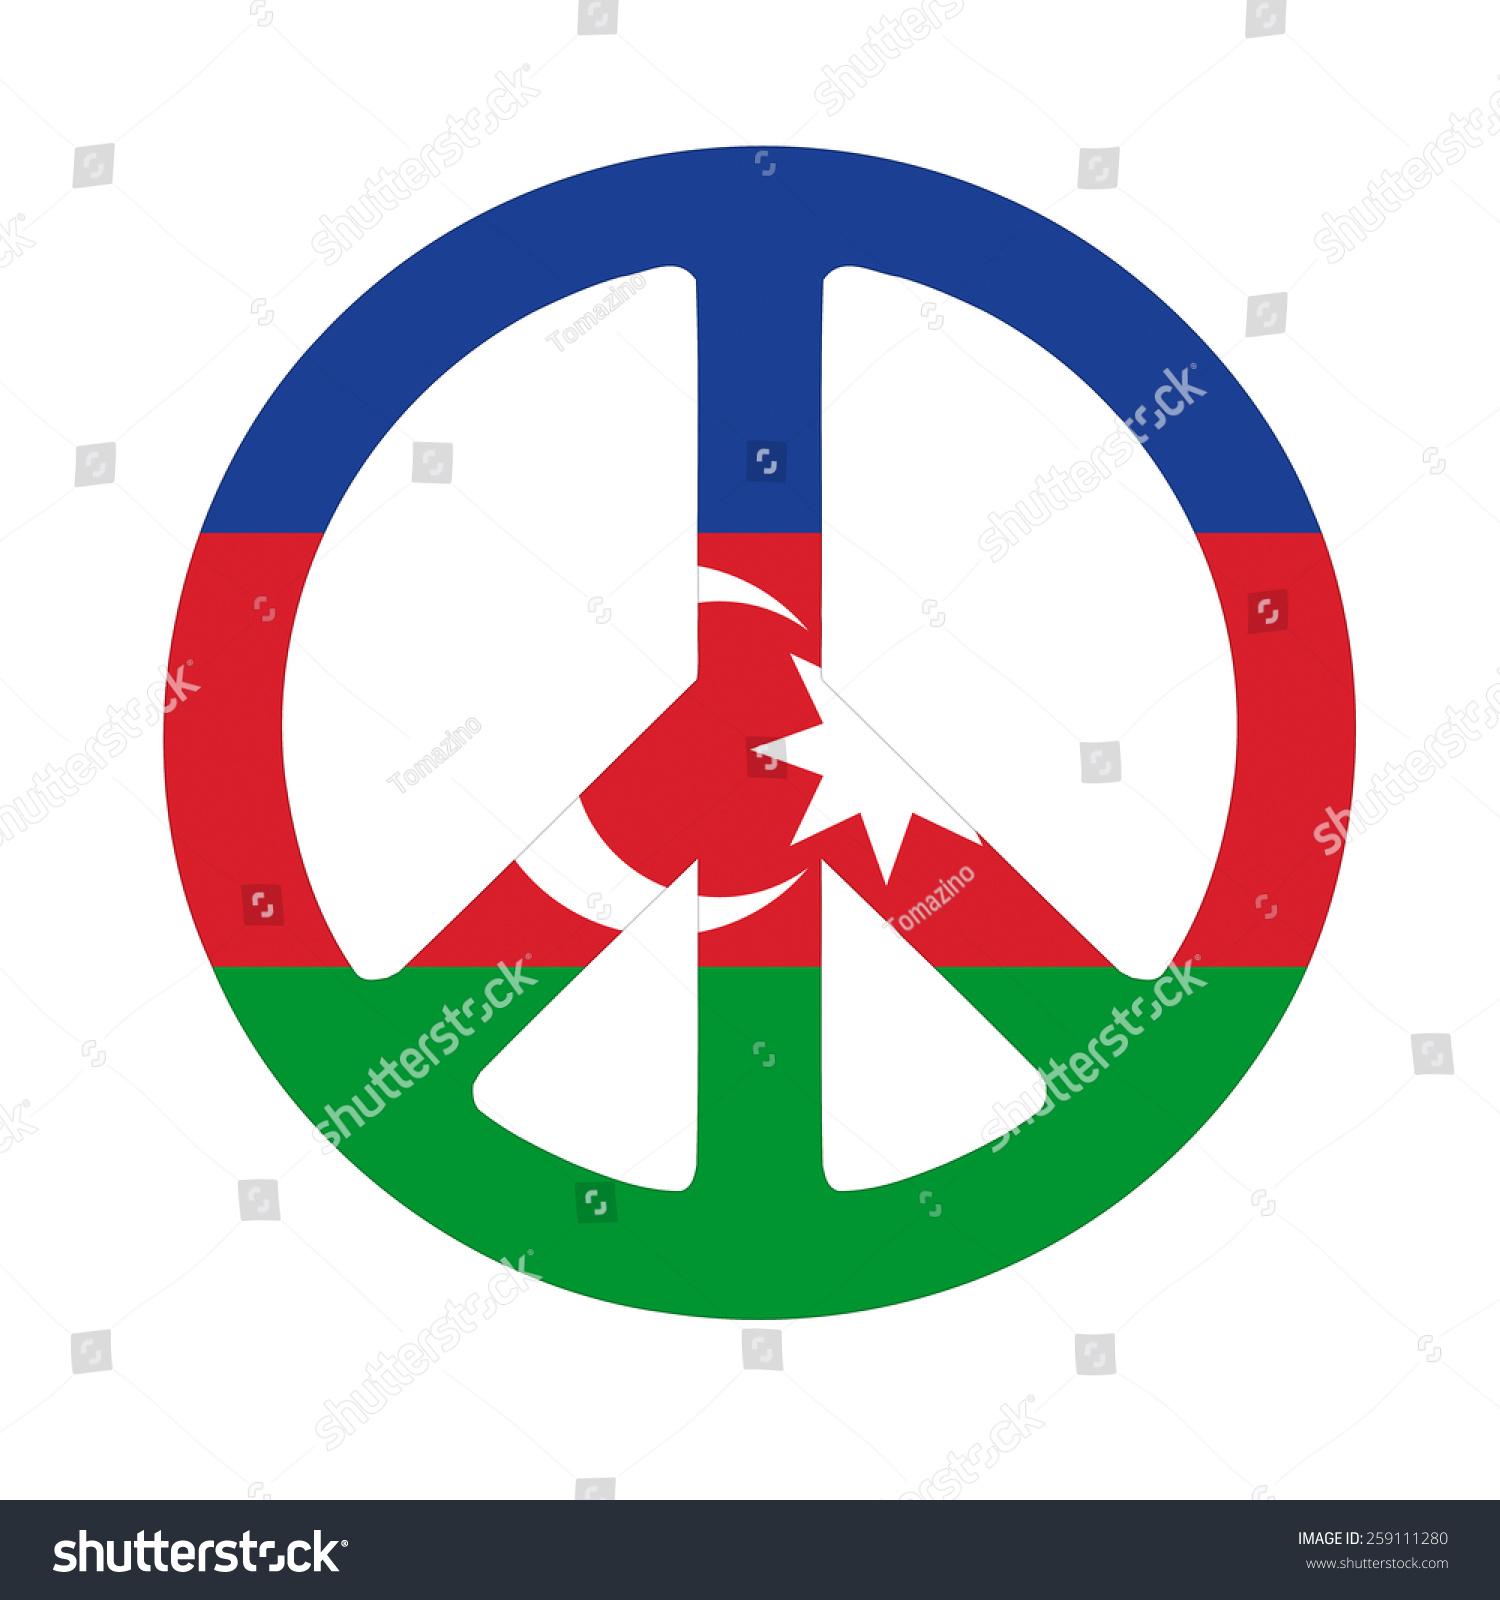 Azerbaijan peace symbol flag stock illustration 259111280 azerbaijan peace symbol flag biocorpaavc